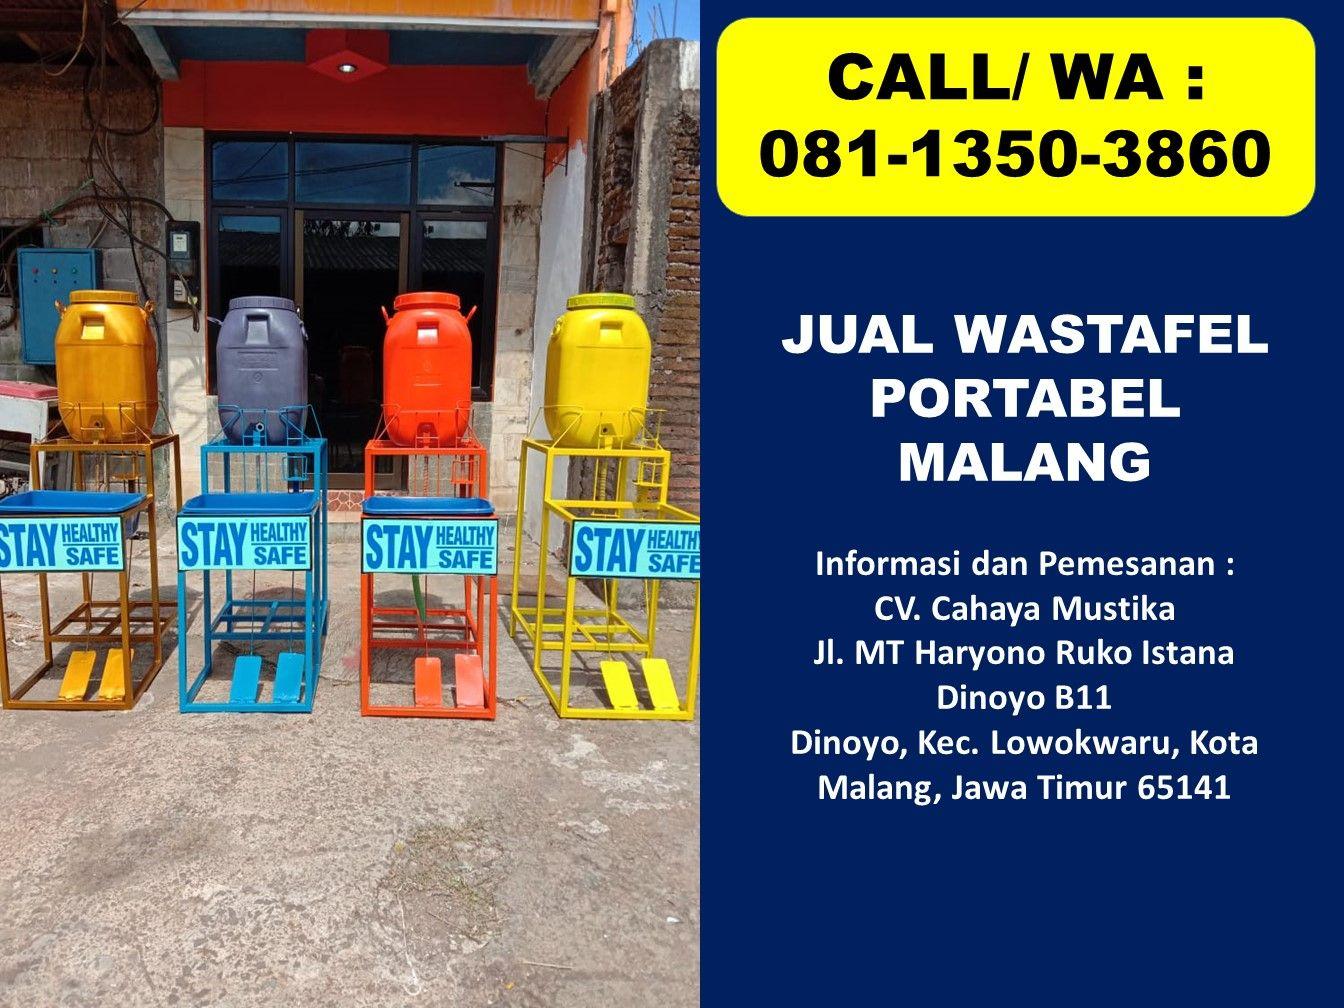 Promo Call Wa 081 1350 3860 Harga Wastafel Portable Malang Ruko Istana Telepon